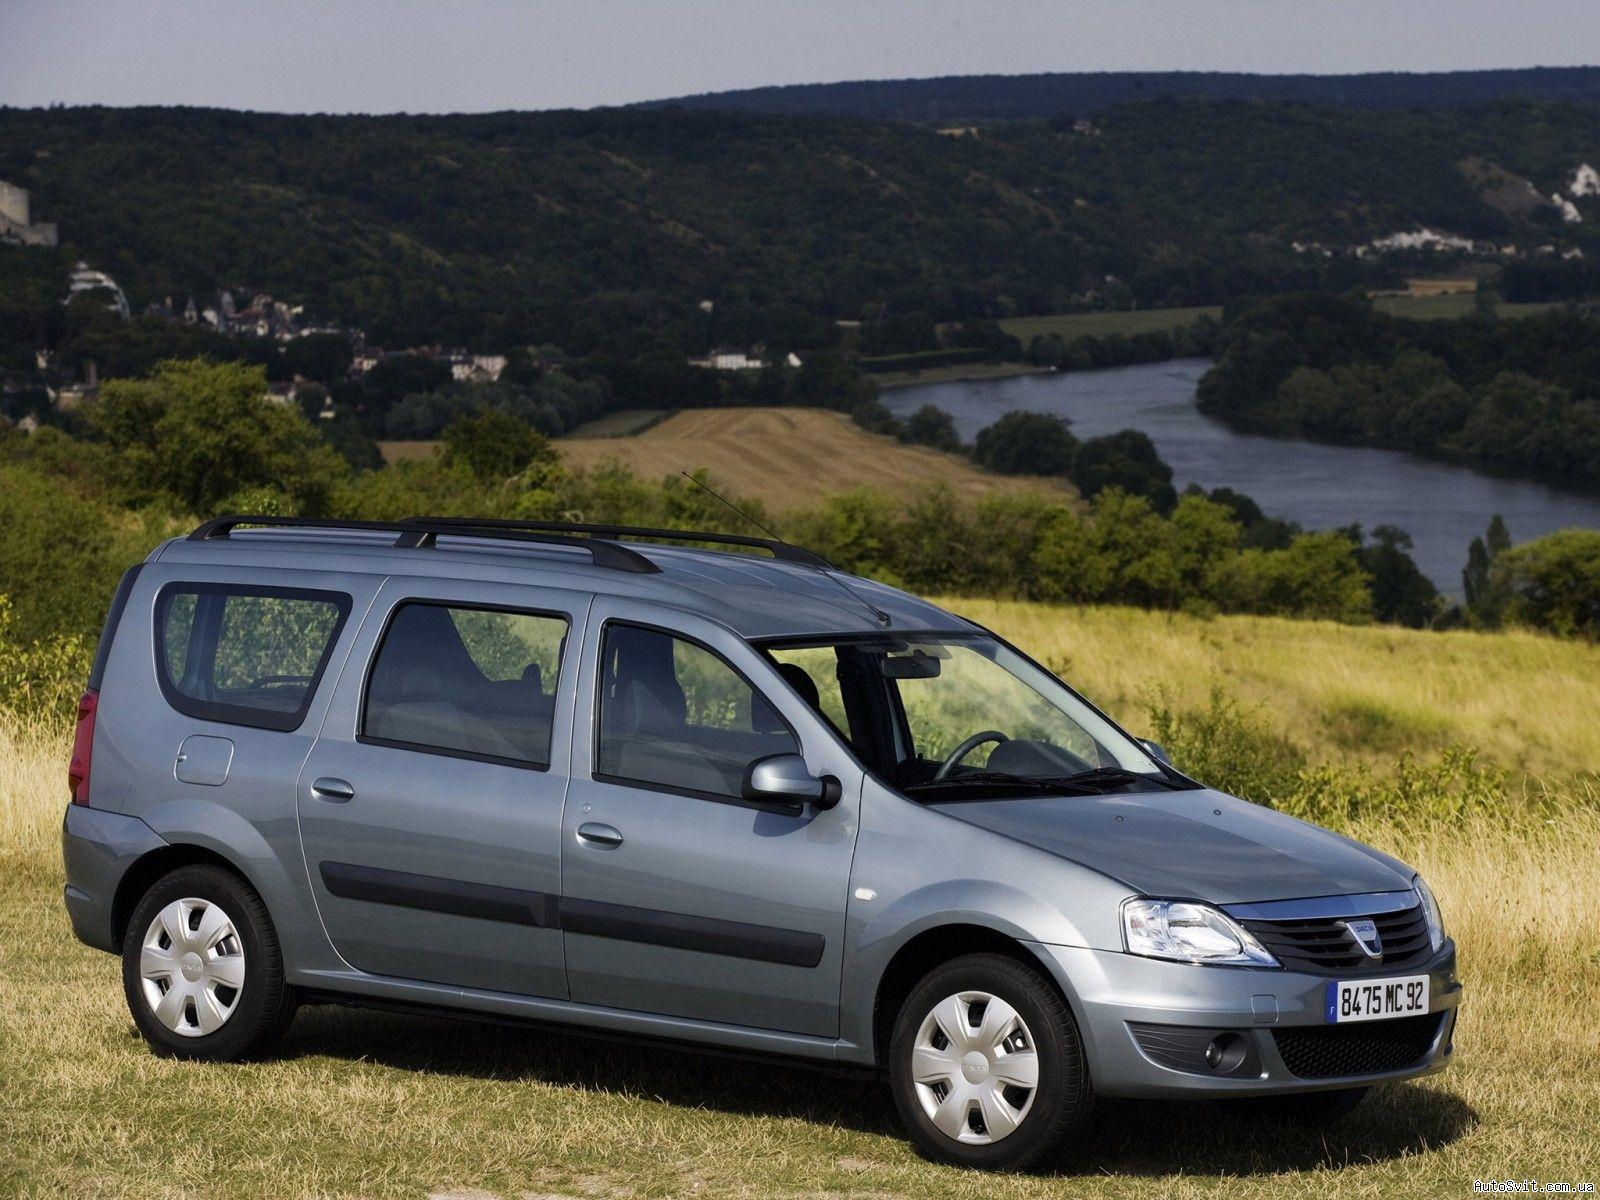 Lada Largus все-таки имеет отличия от Dacia Logan